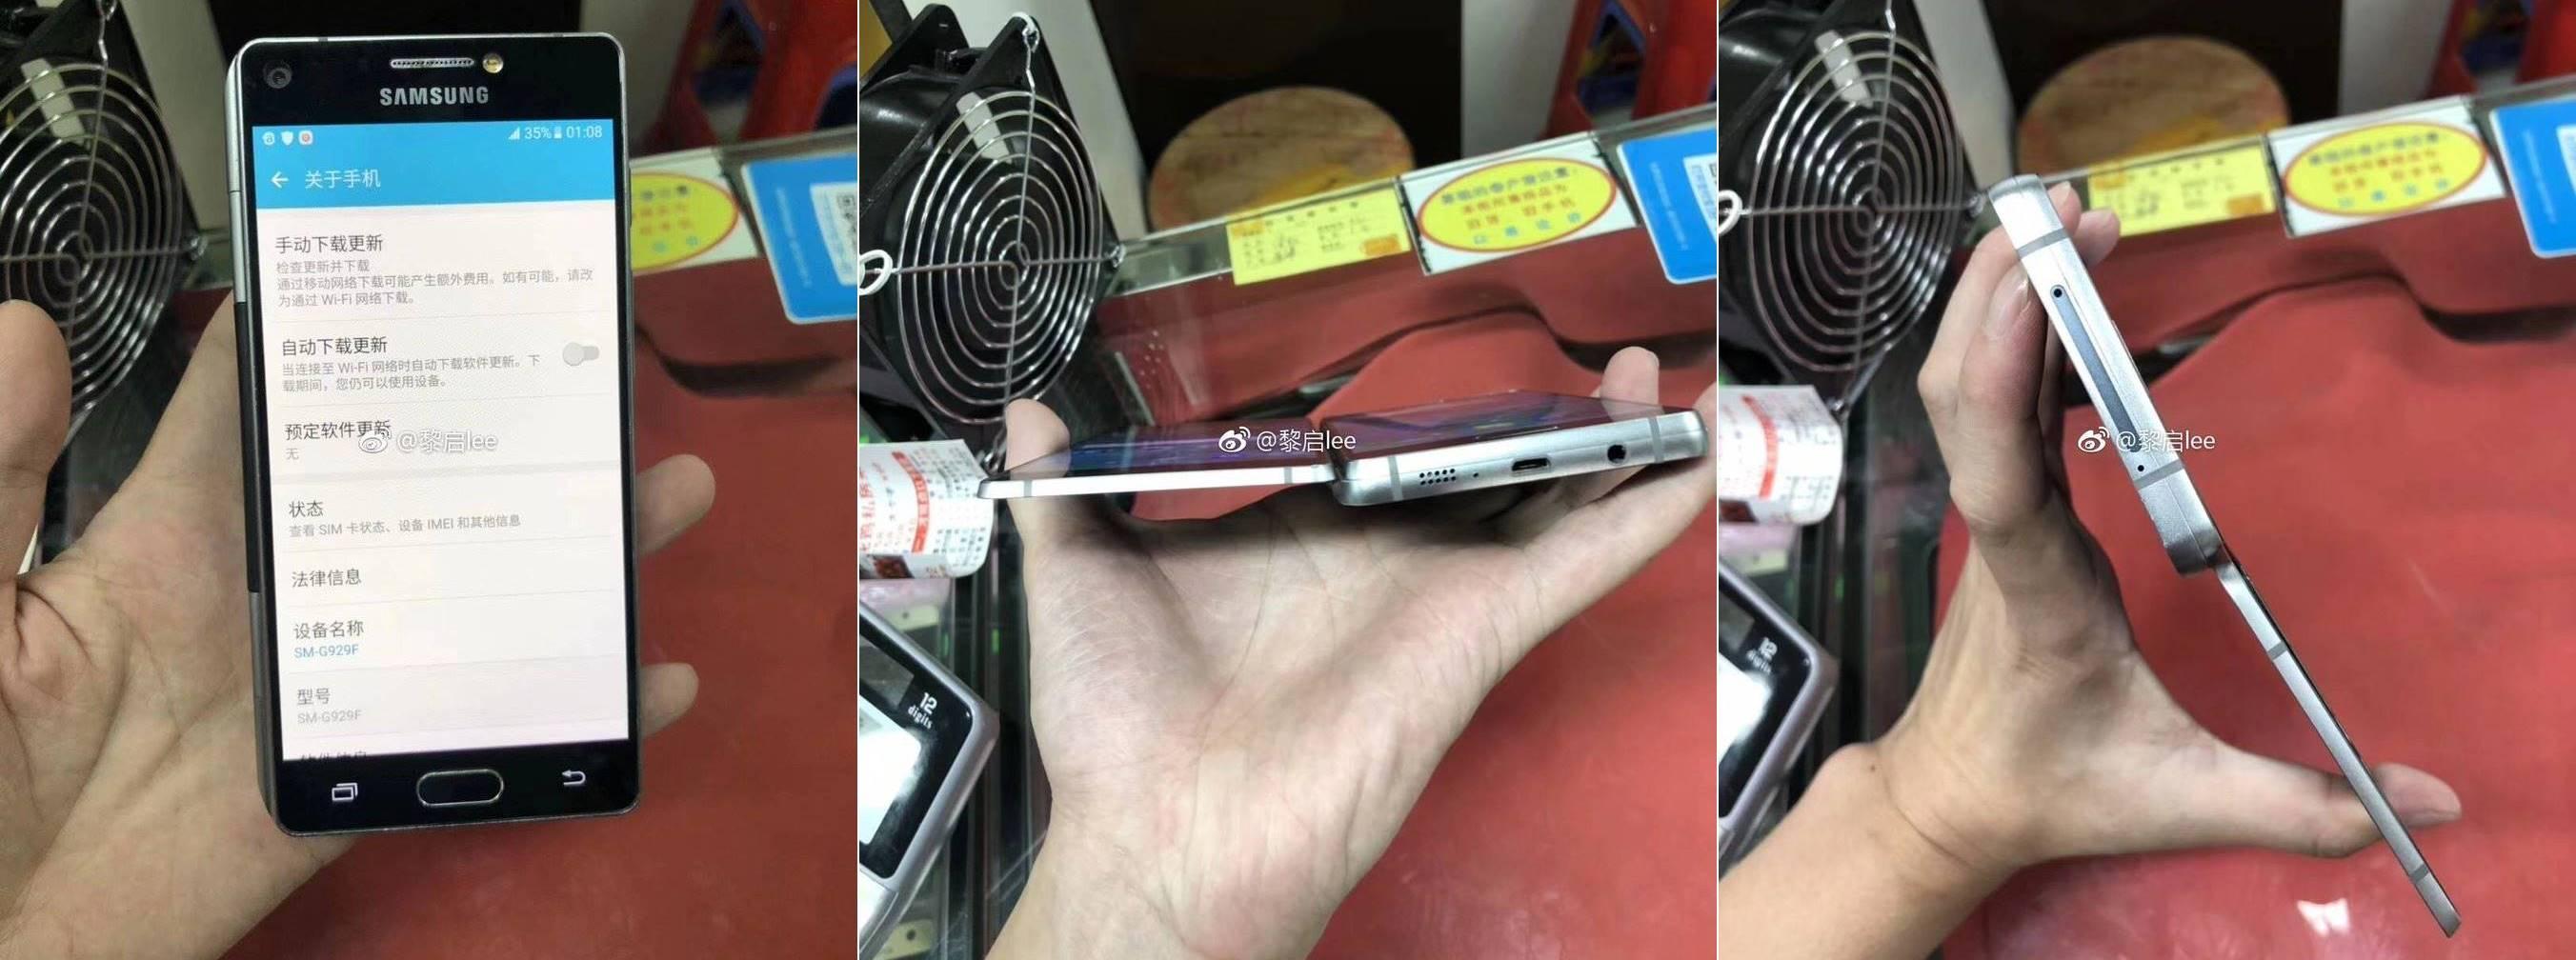 Samsung Galaxy X IMAGINI cu Primul PROTOTIP 2